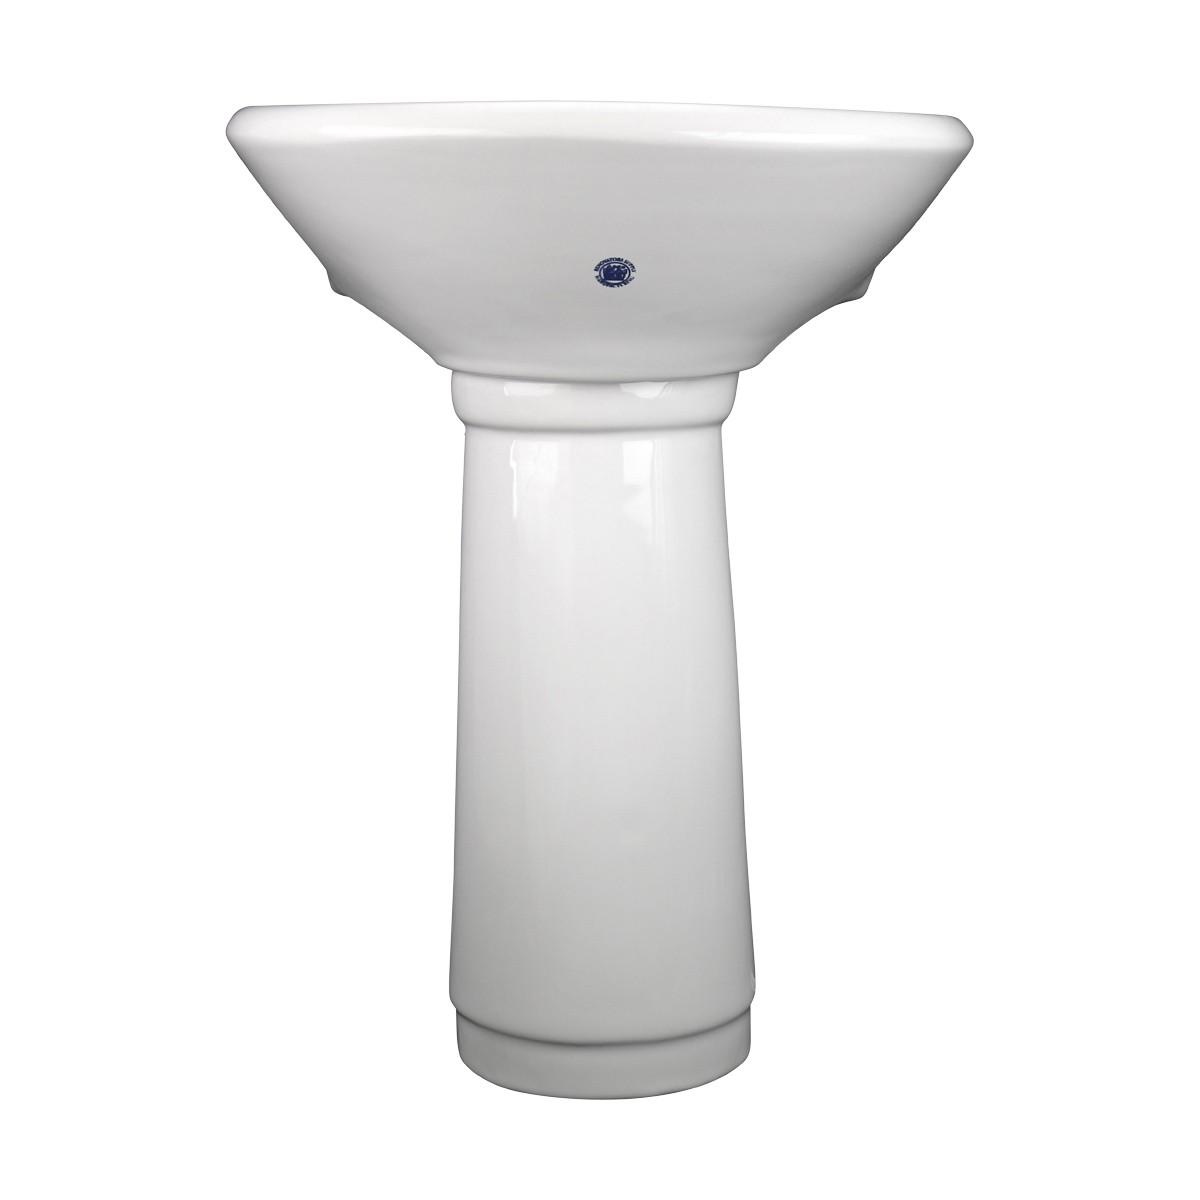 Child Porcelain White Mini Porcelain Pedestal Sink Toddler White Pedestal Sink Childrens sink modern plumbing beautiful ceramic